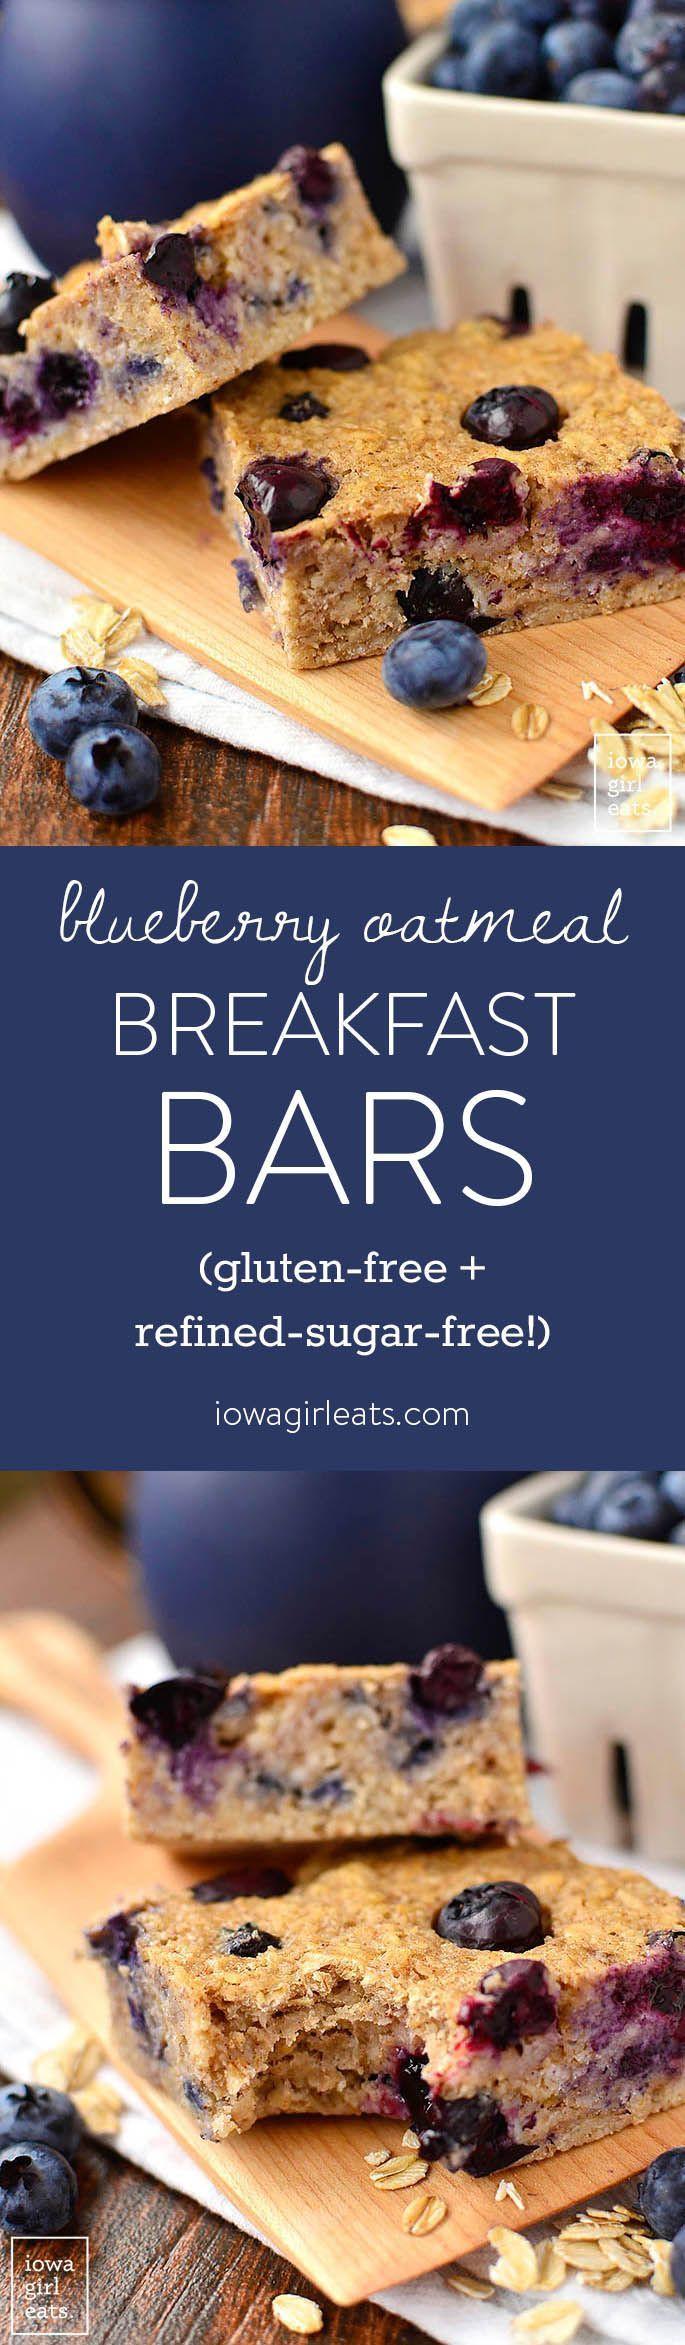 Healthy On The Go Breakfast Bars  17 Best ideas about Healthy Breakfasts on Pinterest